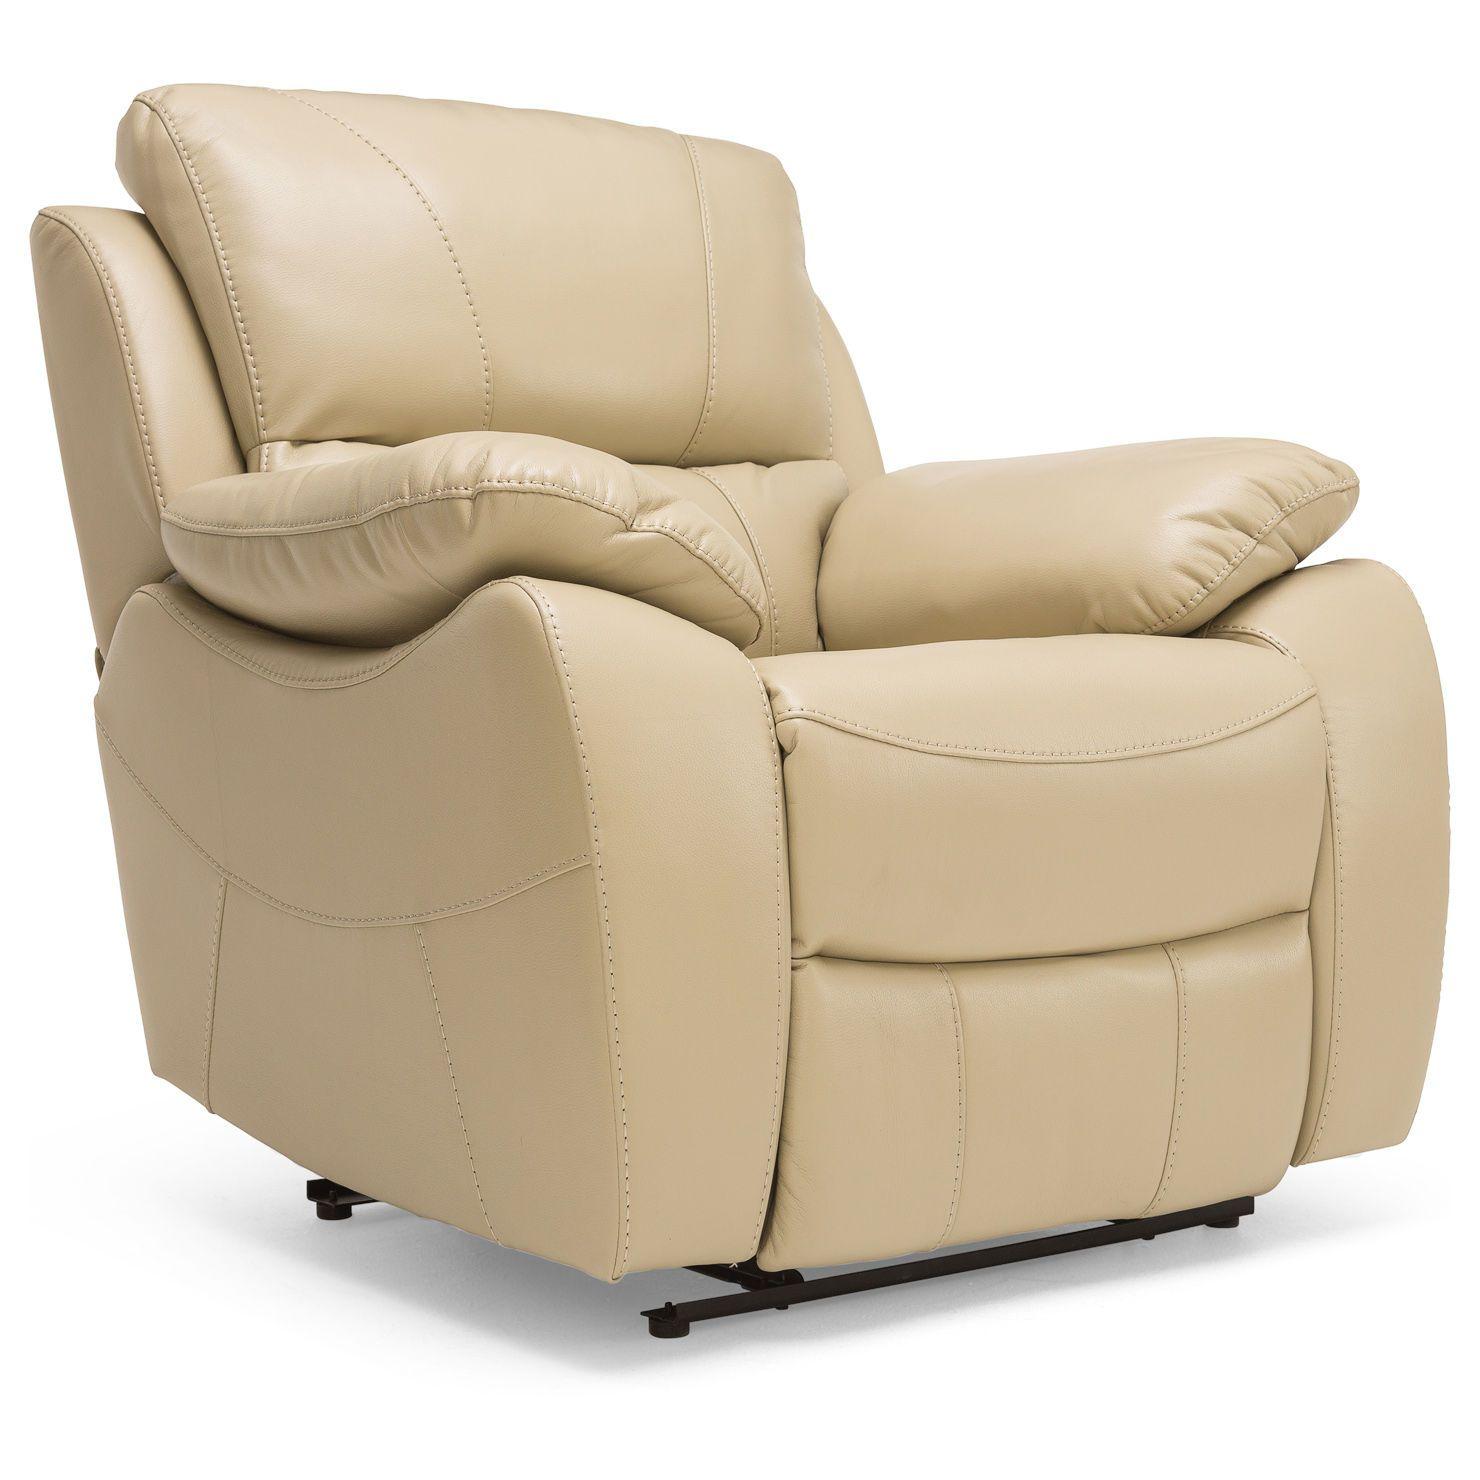 uk armchairs | armchairs cheap | armchairs | armchairs uk ...